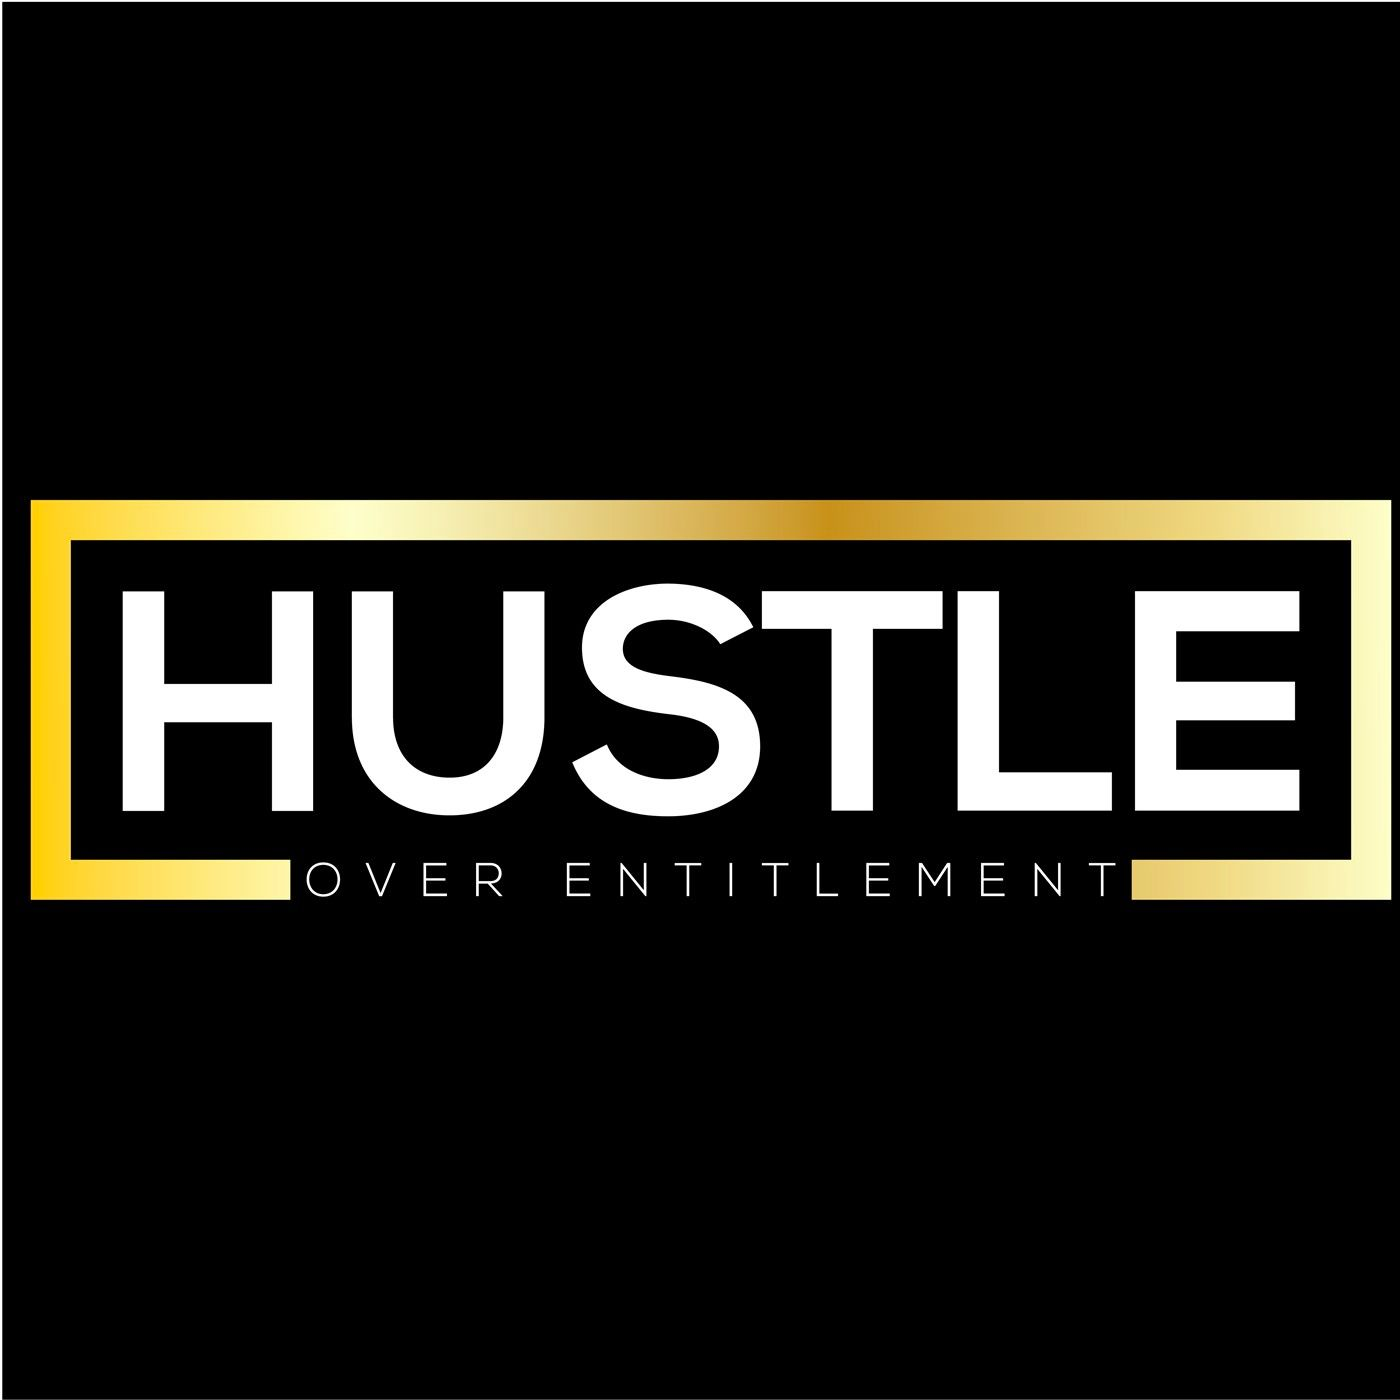 Hustle Over Entitlement show art